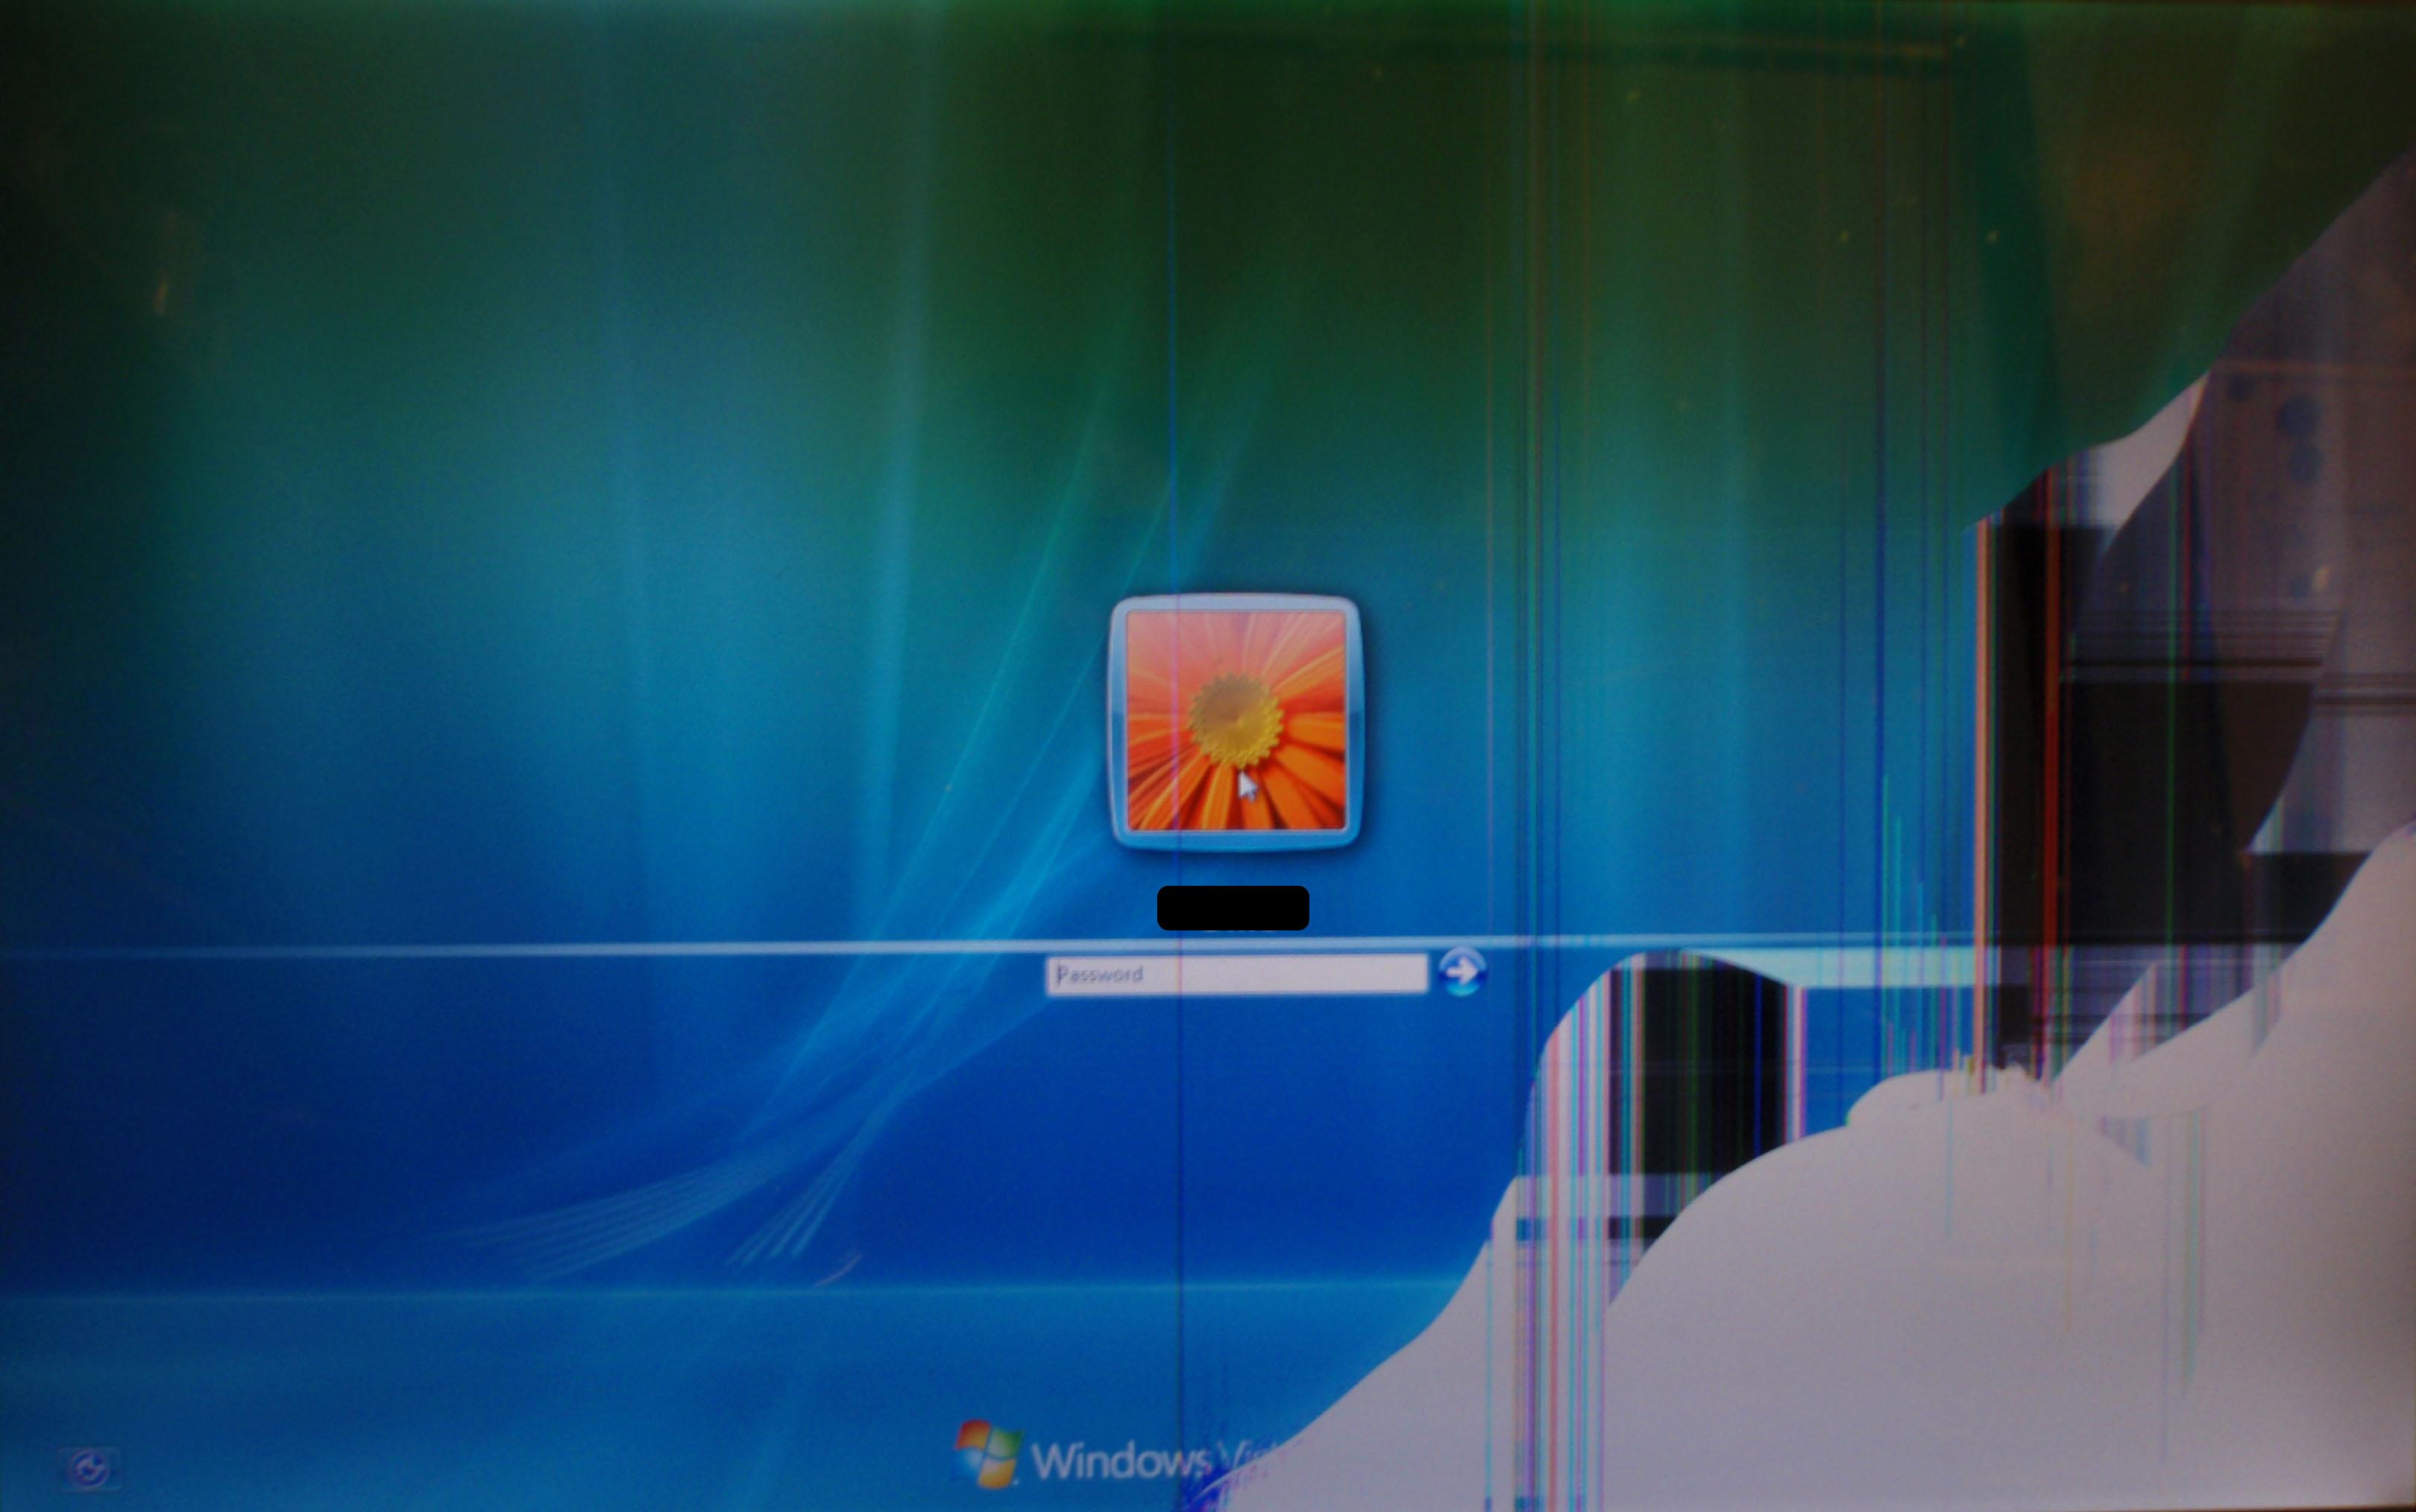 45 Realistic Cracked and Broken Screen Wallpapers   Technosamrat 3240x2028